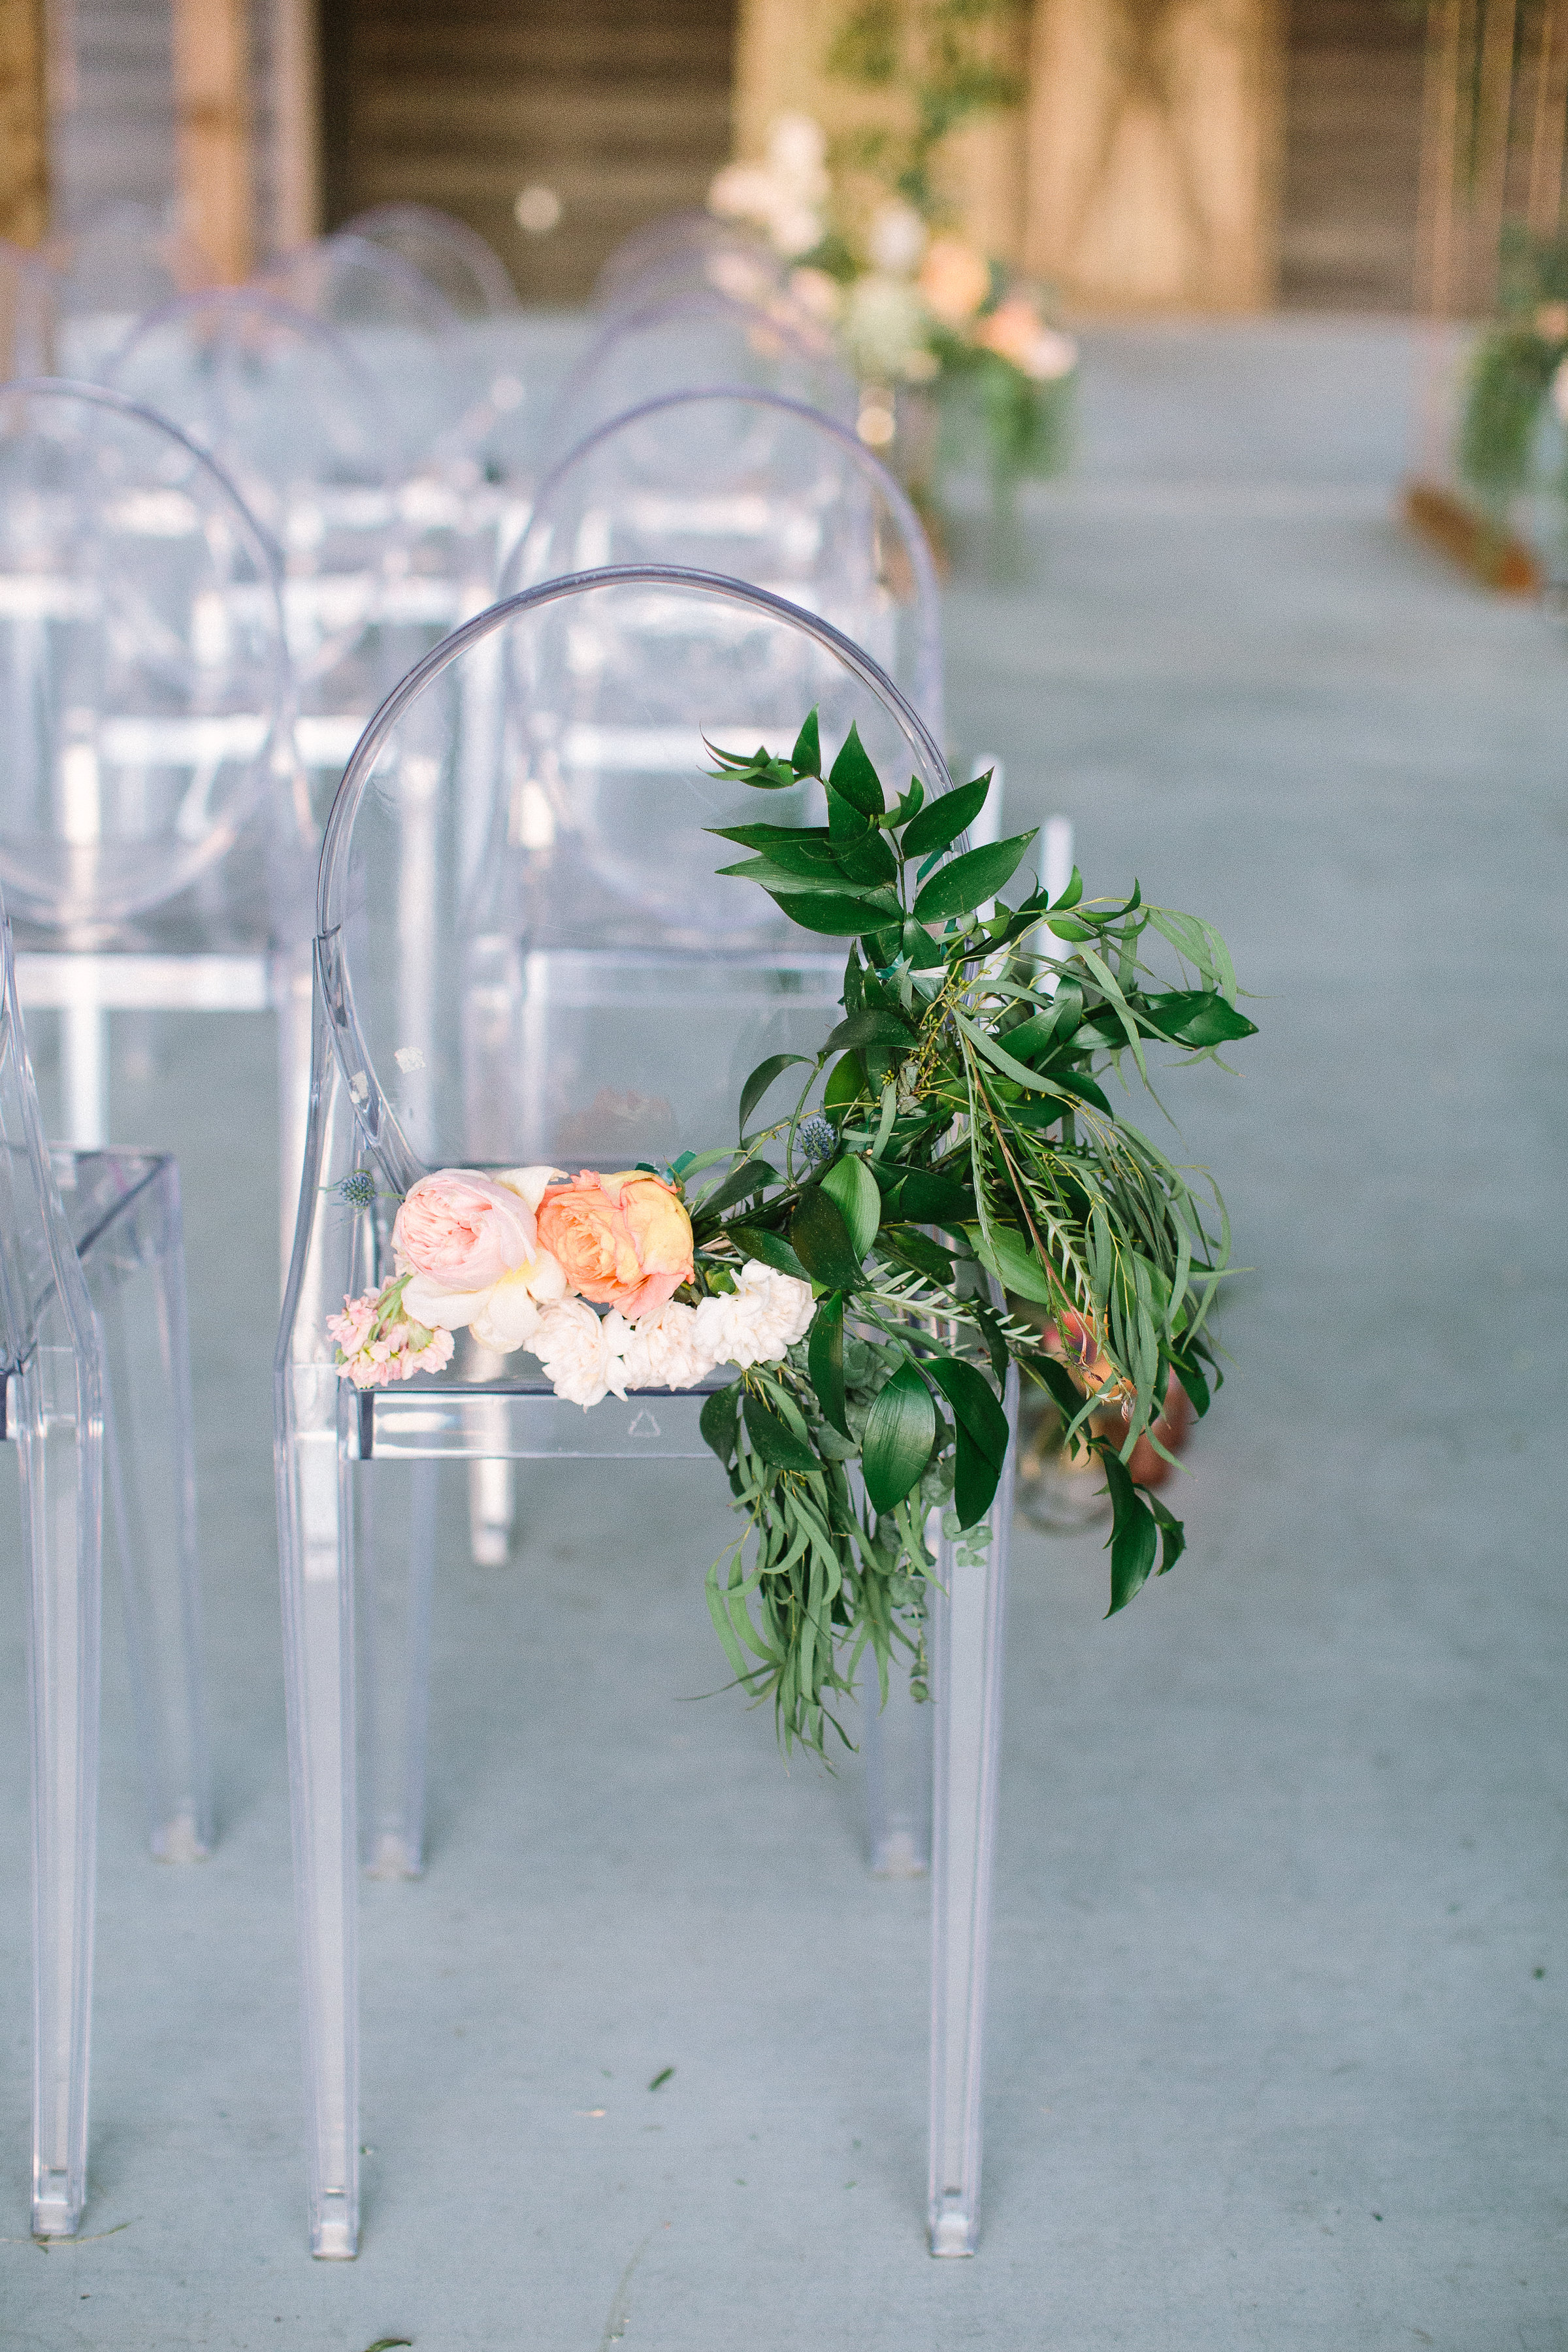 Ellen-Ashton-Photography-Peach-Creek-Ranch-Weddings-Wed-and-Prosper372